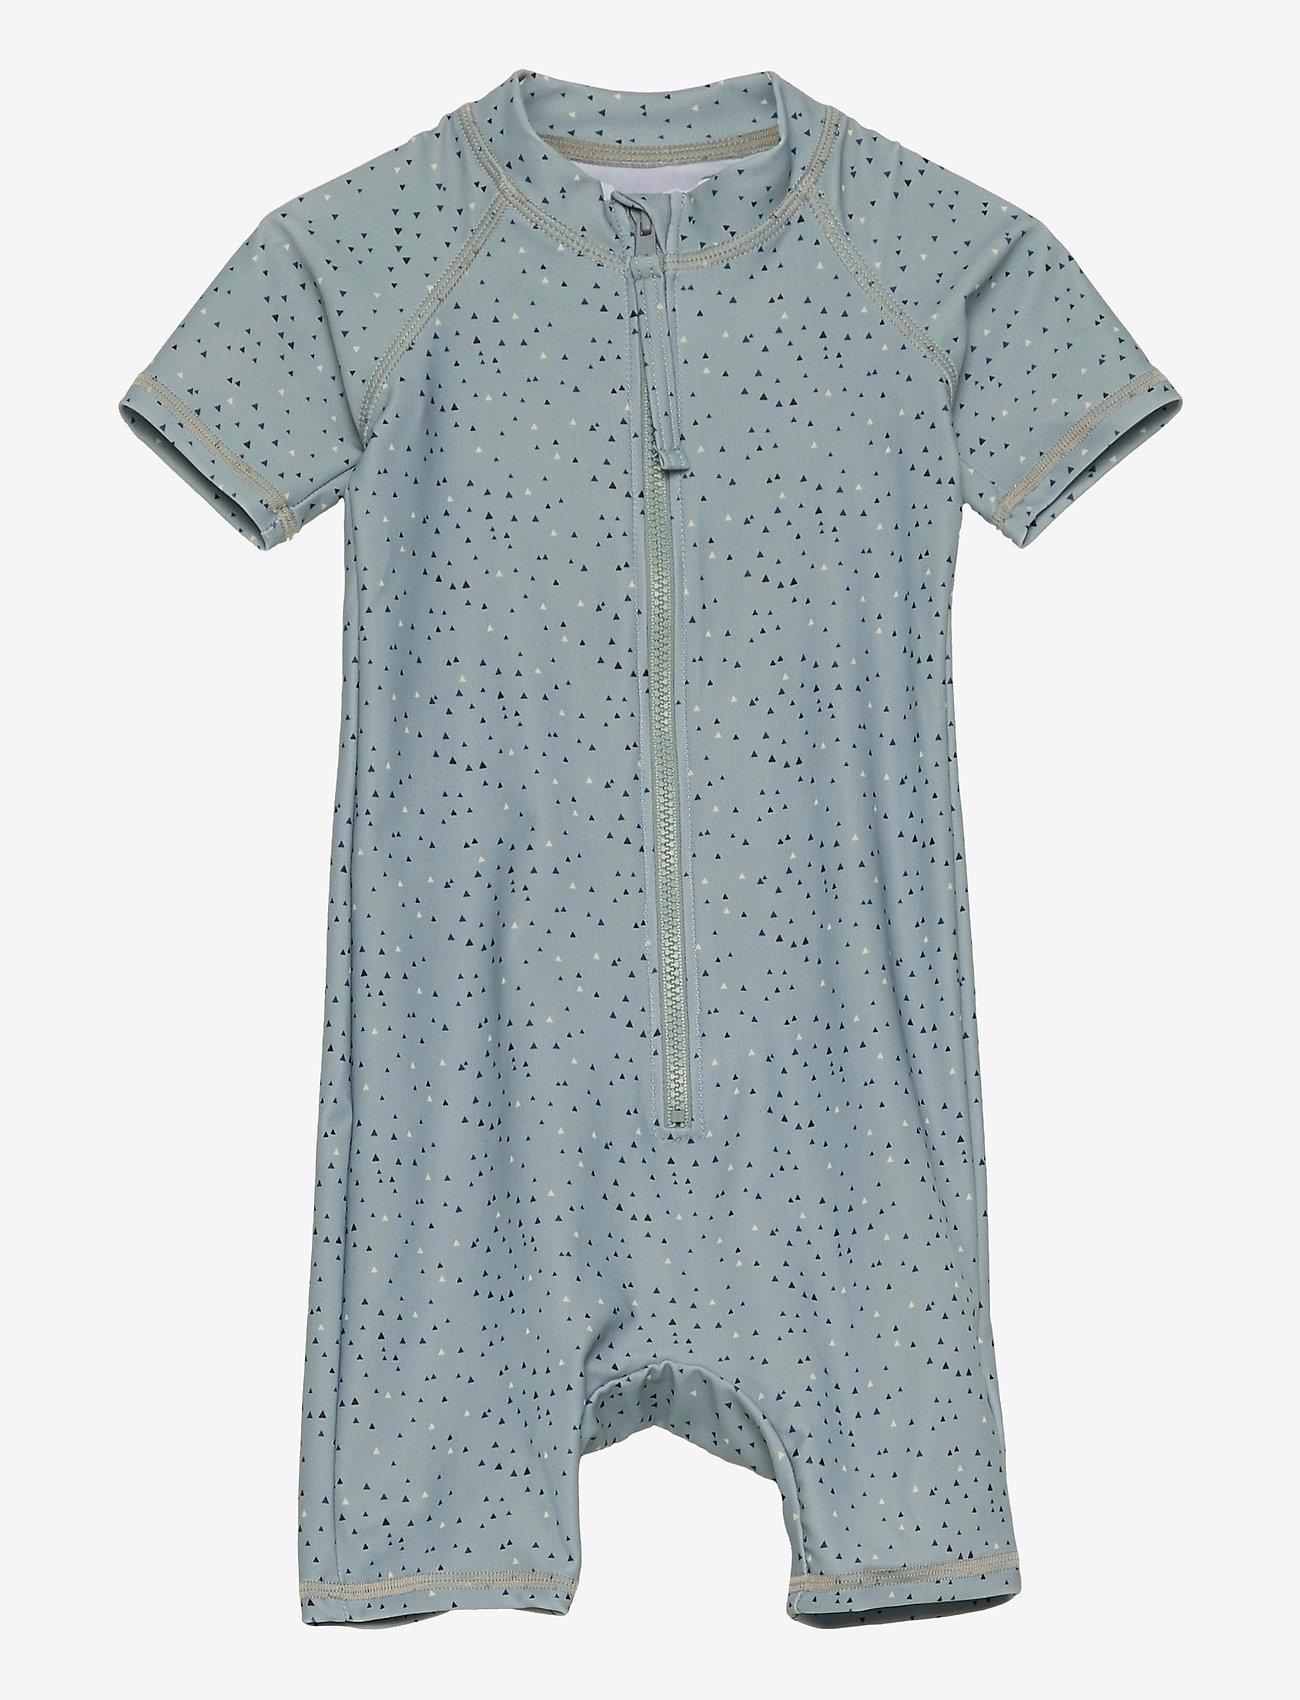 Petit by Sofie Schnoor - Swim suit - uv-anzug - dusty blue - 0